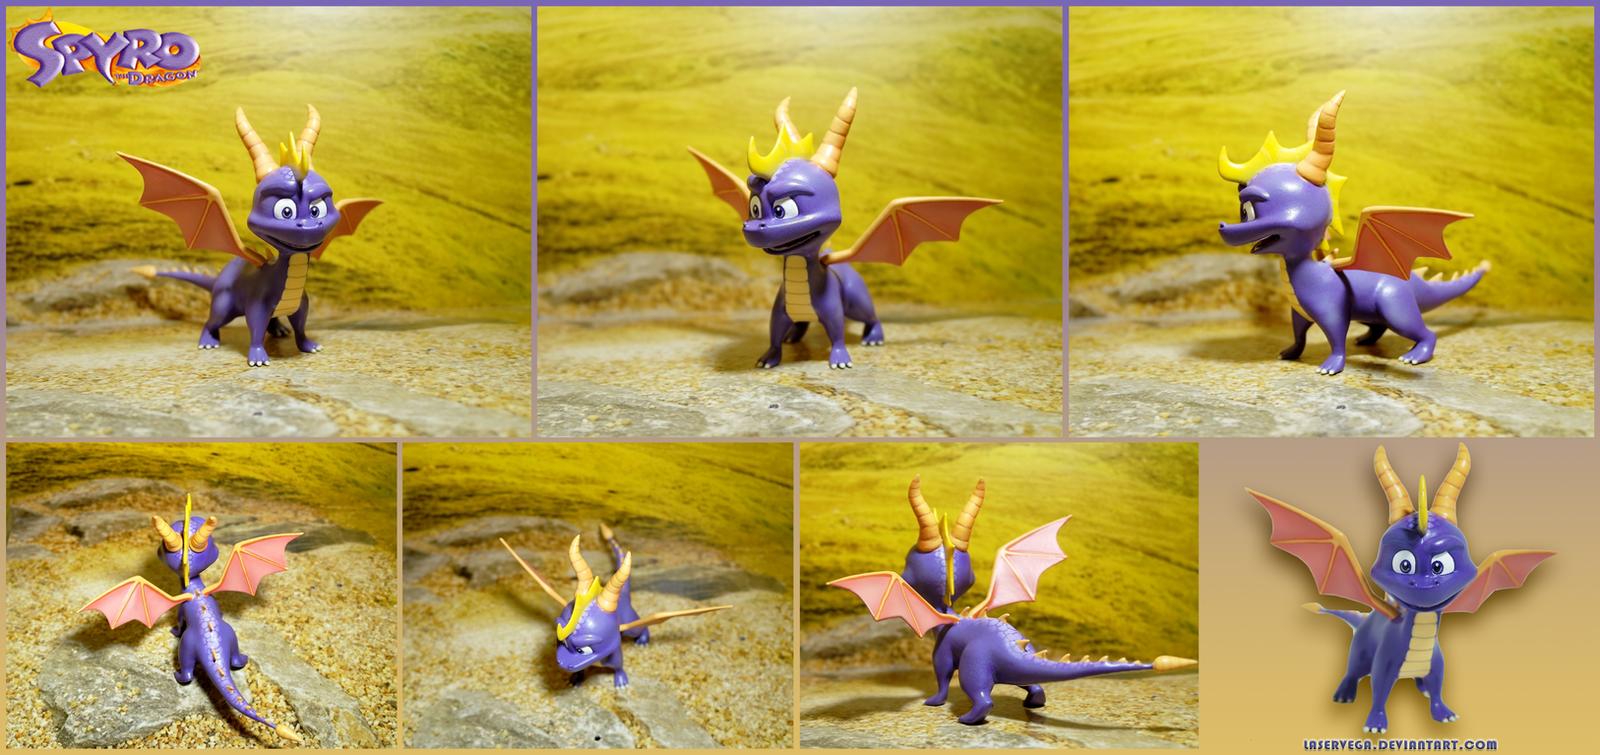 Classic Spyro figure by Laservega